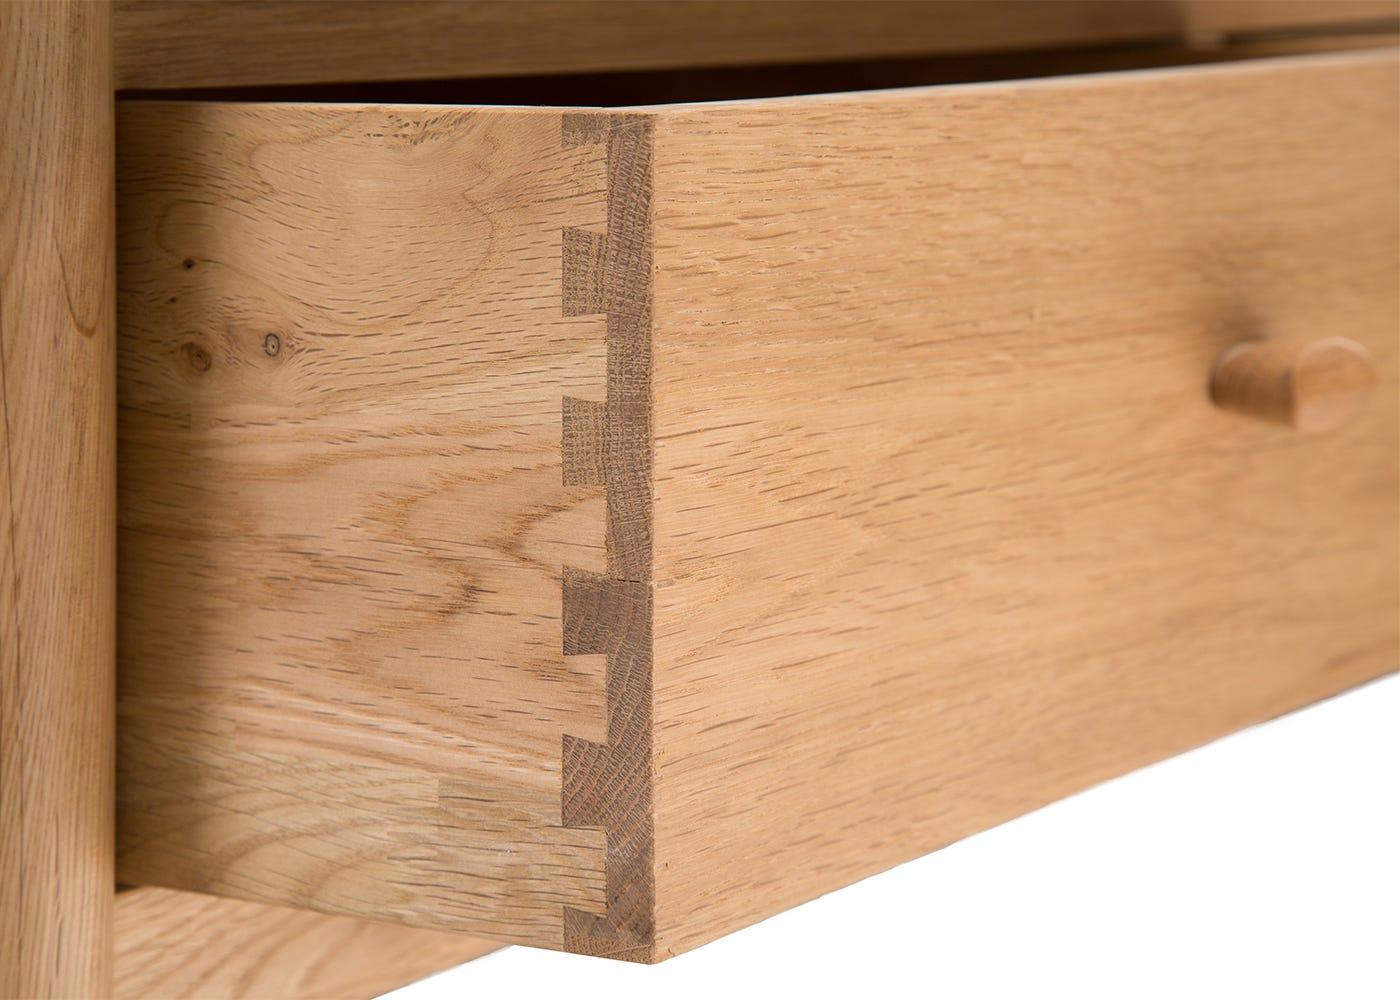 Teramo Coffee Table - Dovetail